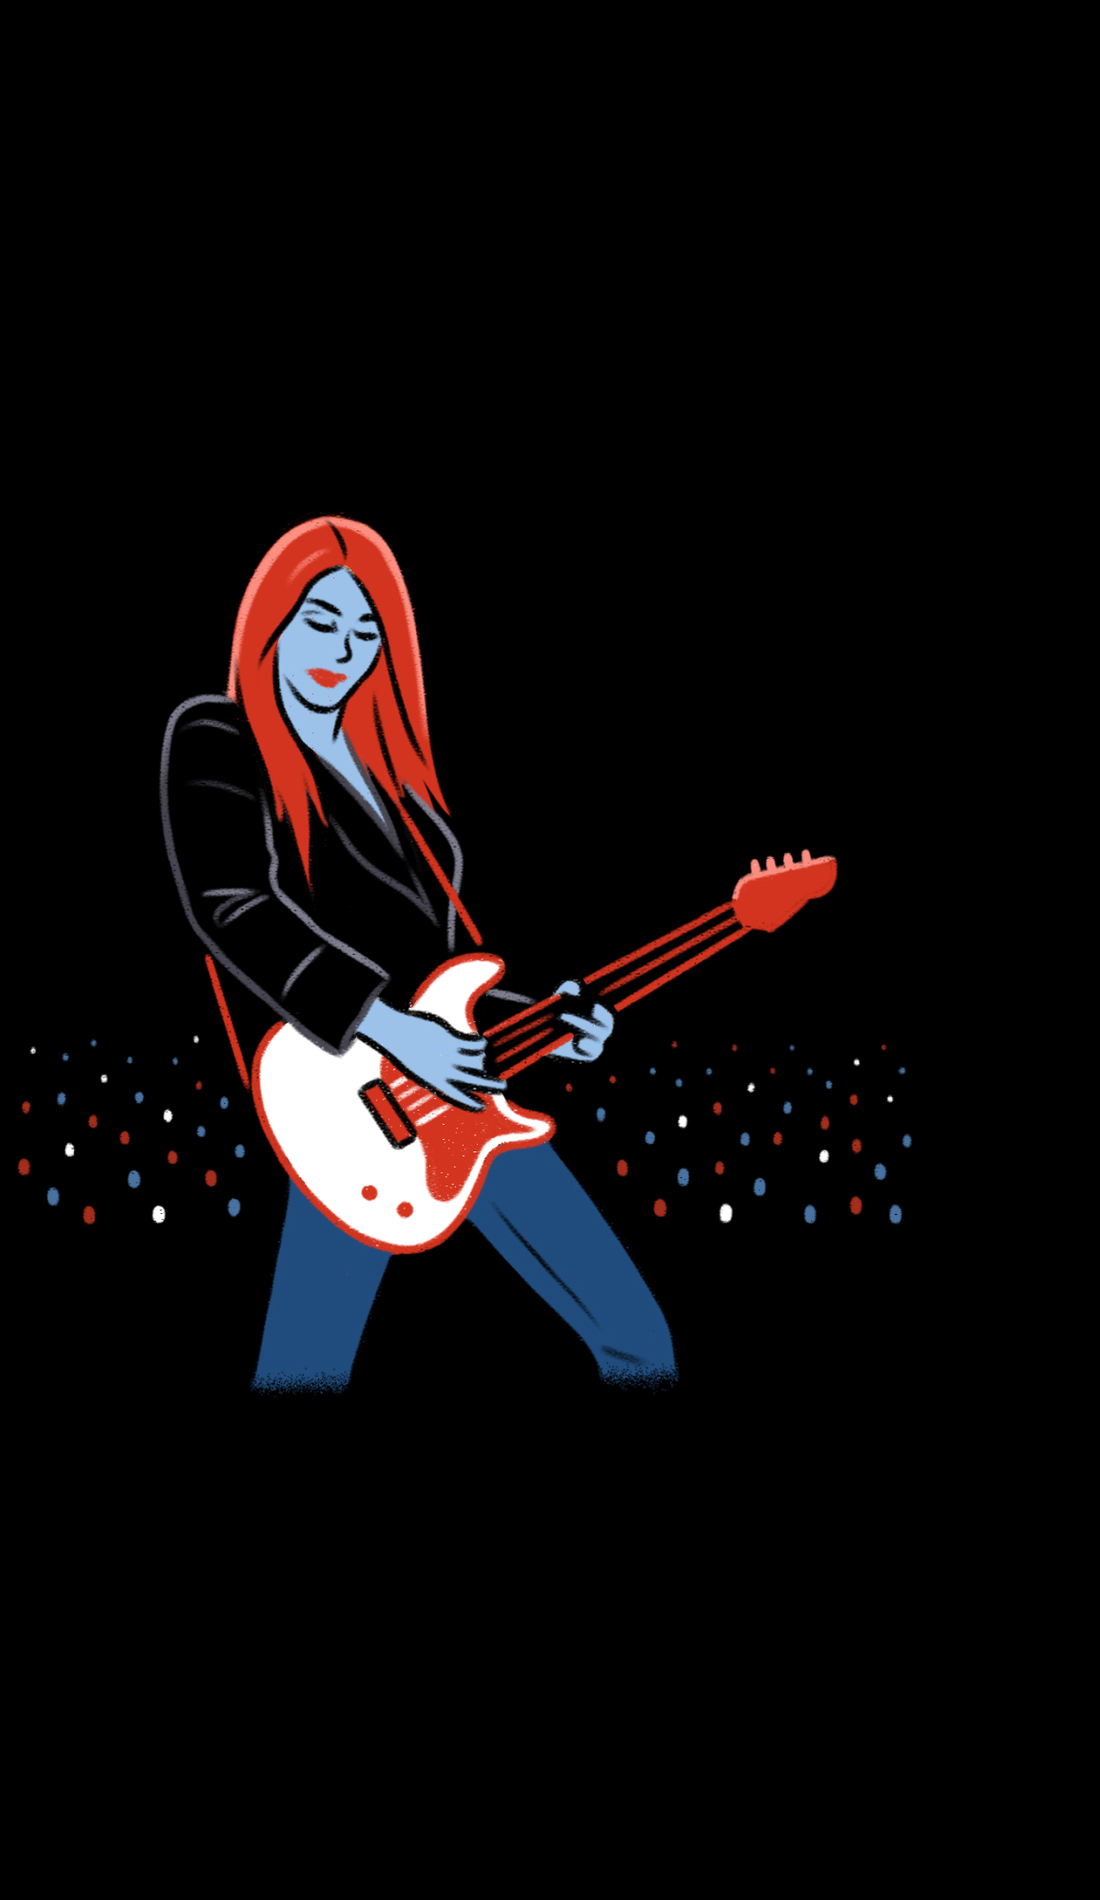 A Avenue Beat live event